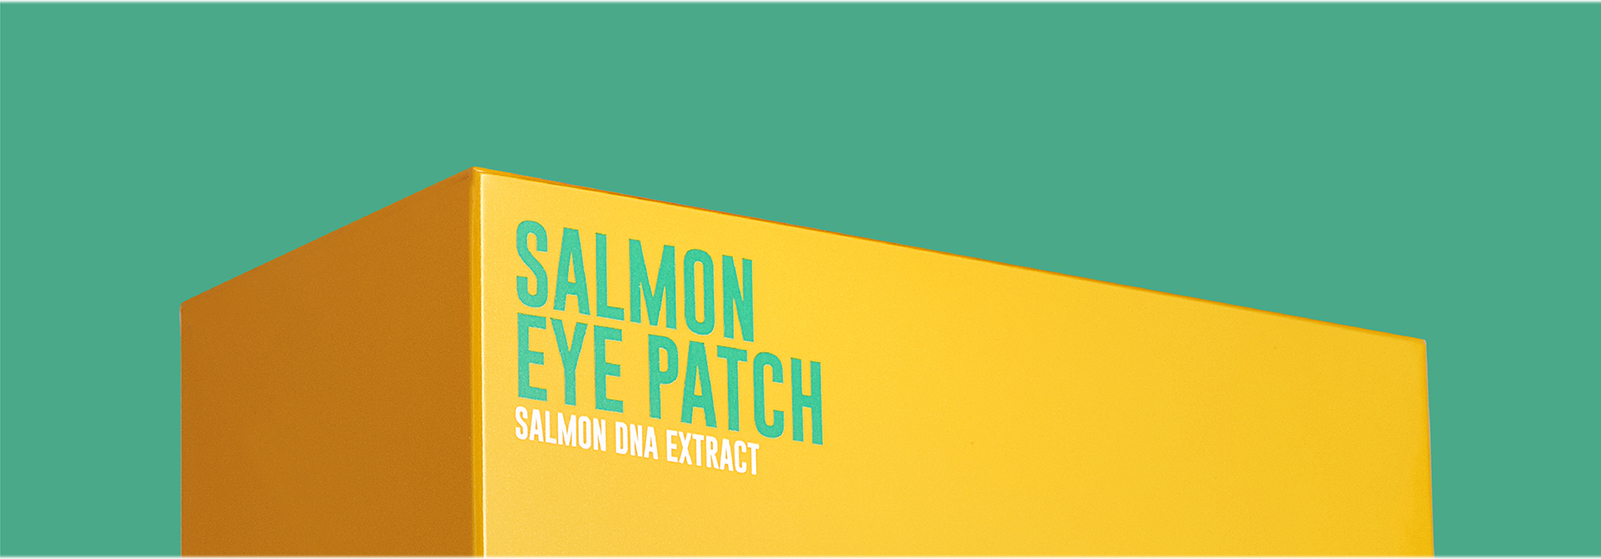 eye patch3